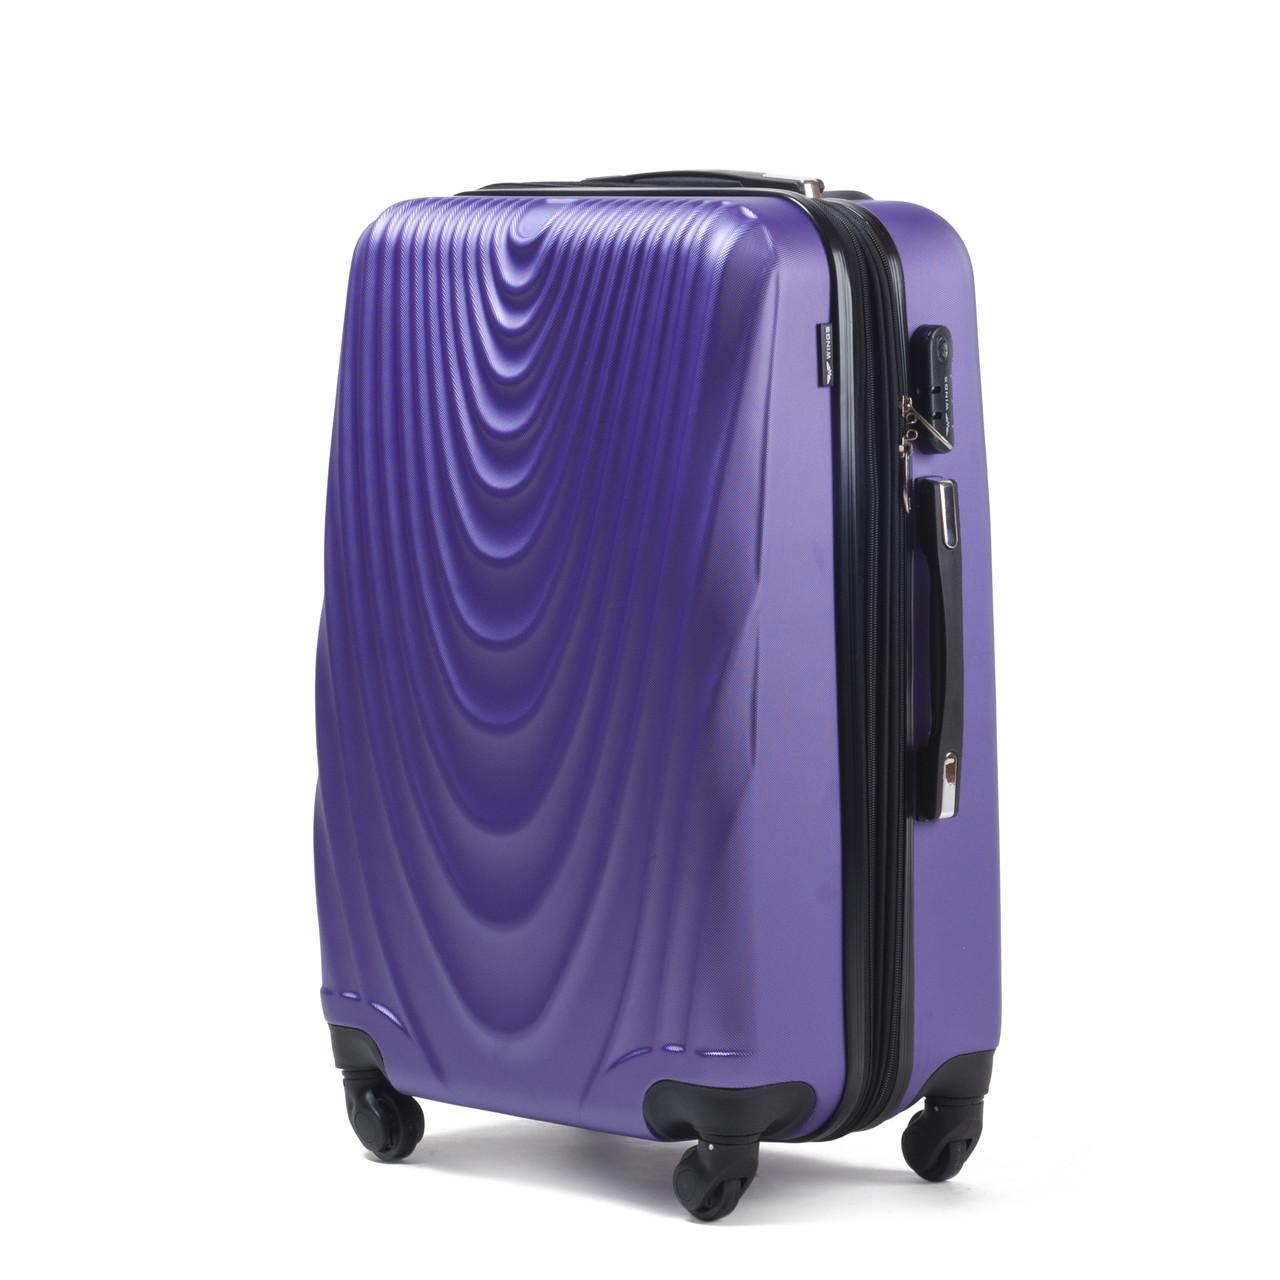 Чемодан Wings 304 средний 66х43х27 см 66л пластиковый на 4 колесах Фиолетовый